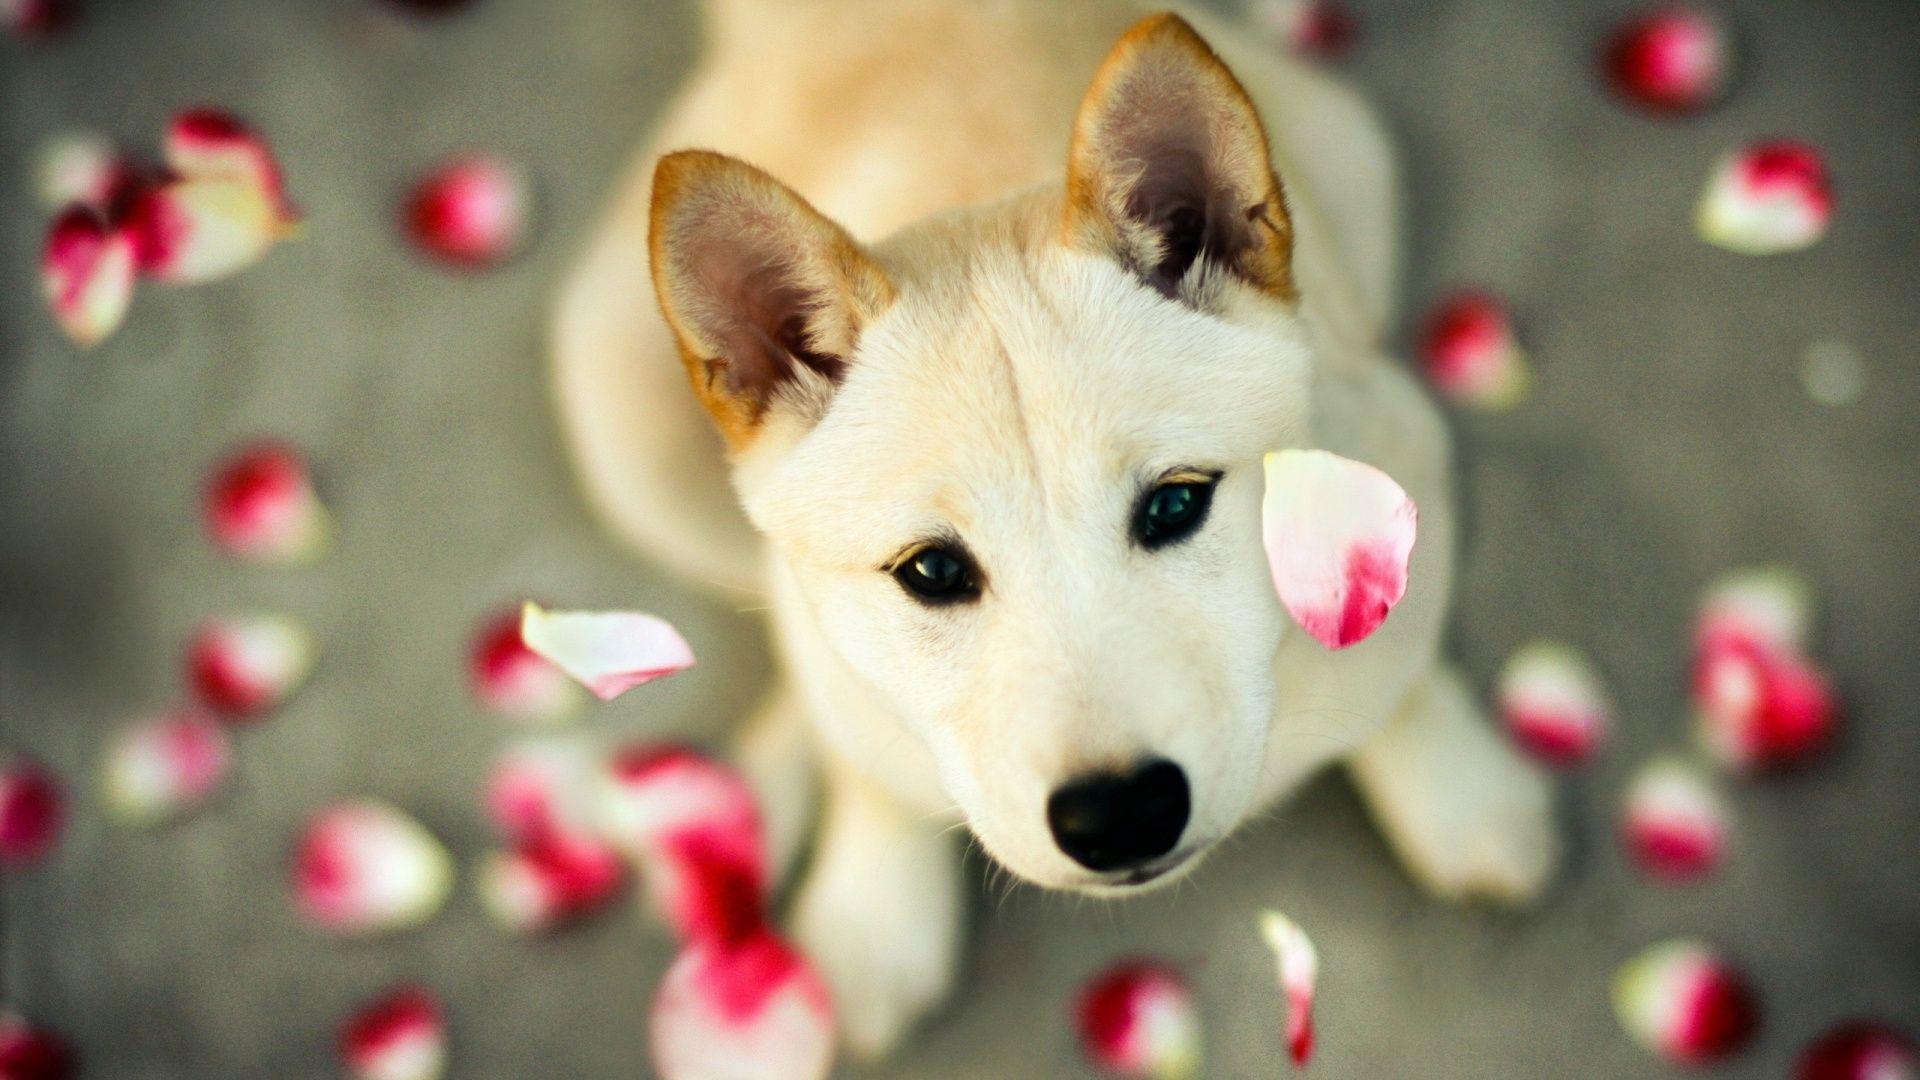 dogs wallpapers (42 wallpapers) – adorable wallpapers